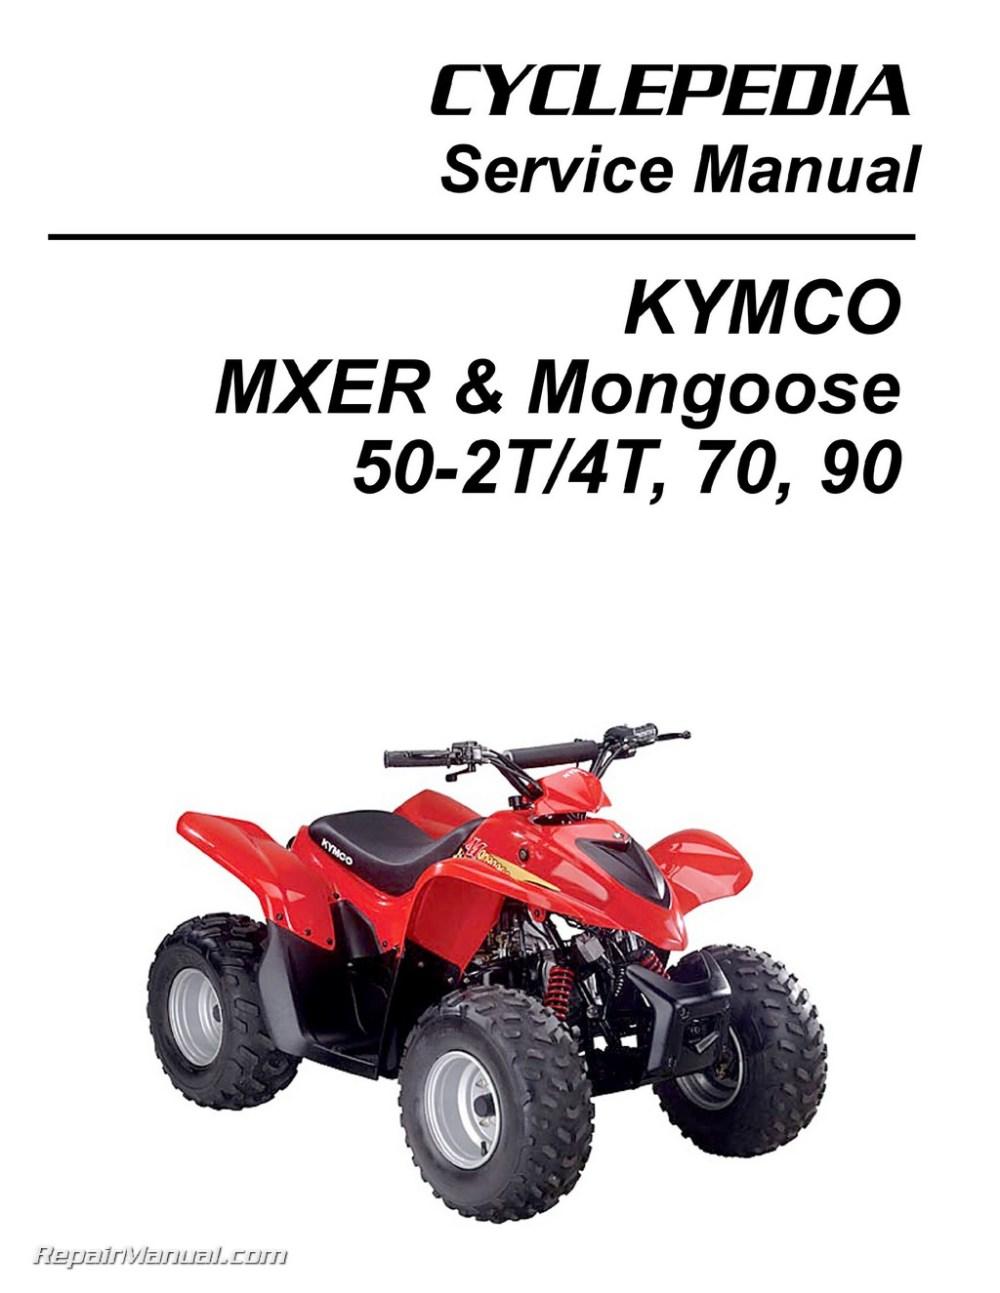 medium resolution of kymco mxer mongoose 50 2t 50 4t 70 90cc atv printed service manual chinese 110cc atv wiring diagram atv repair diagram